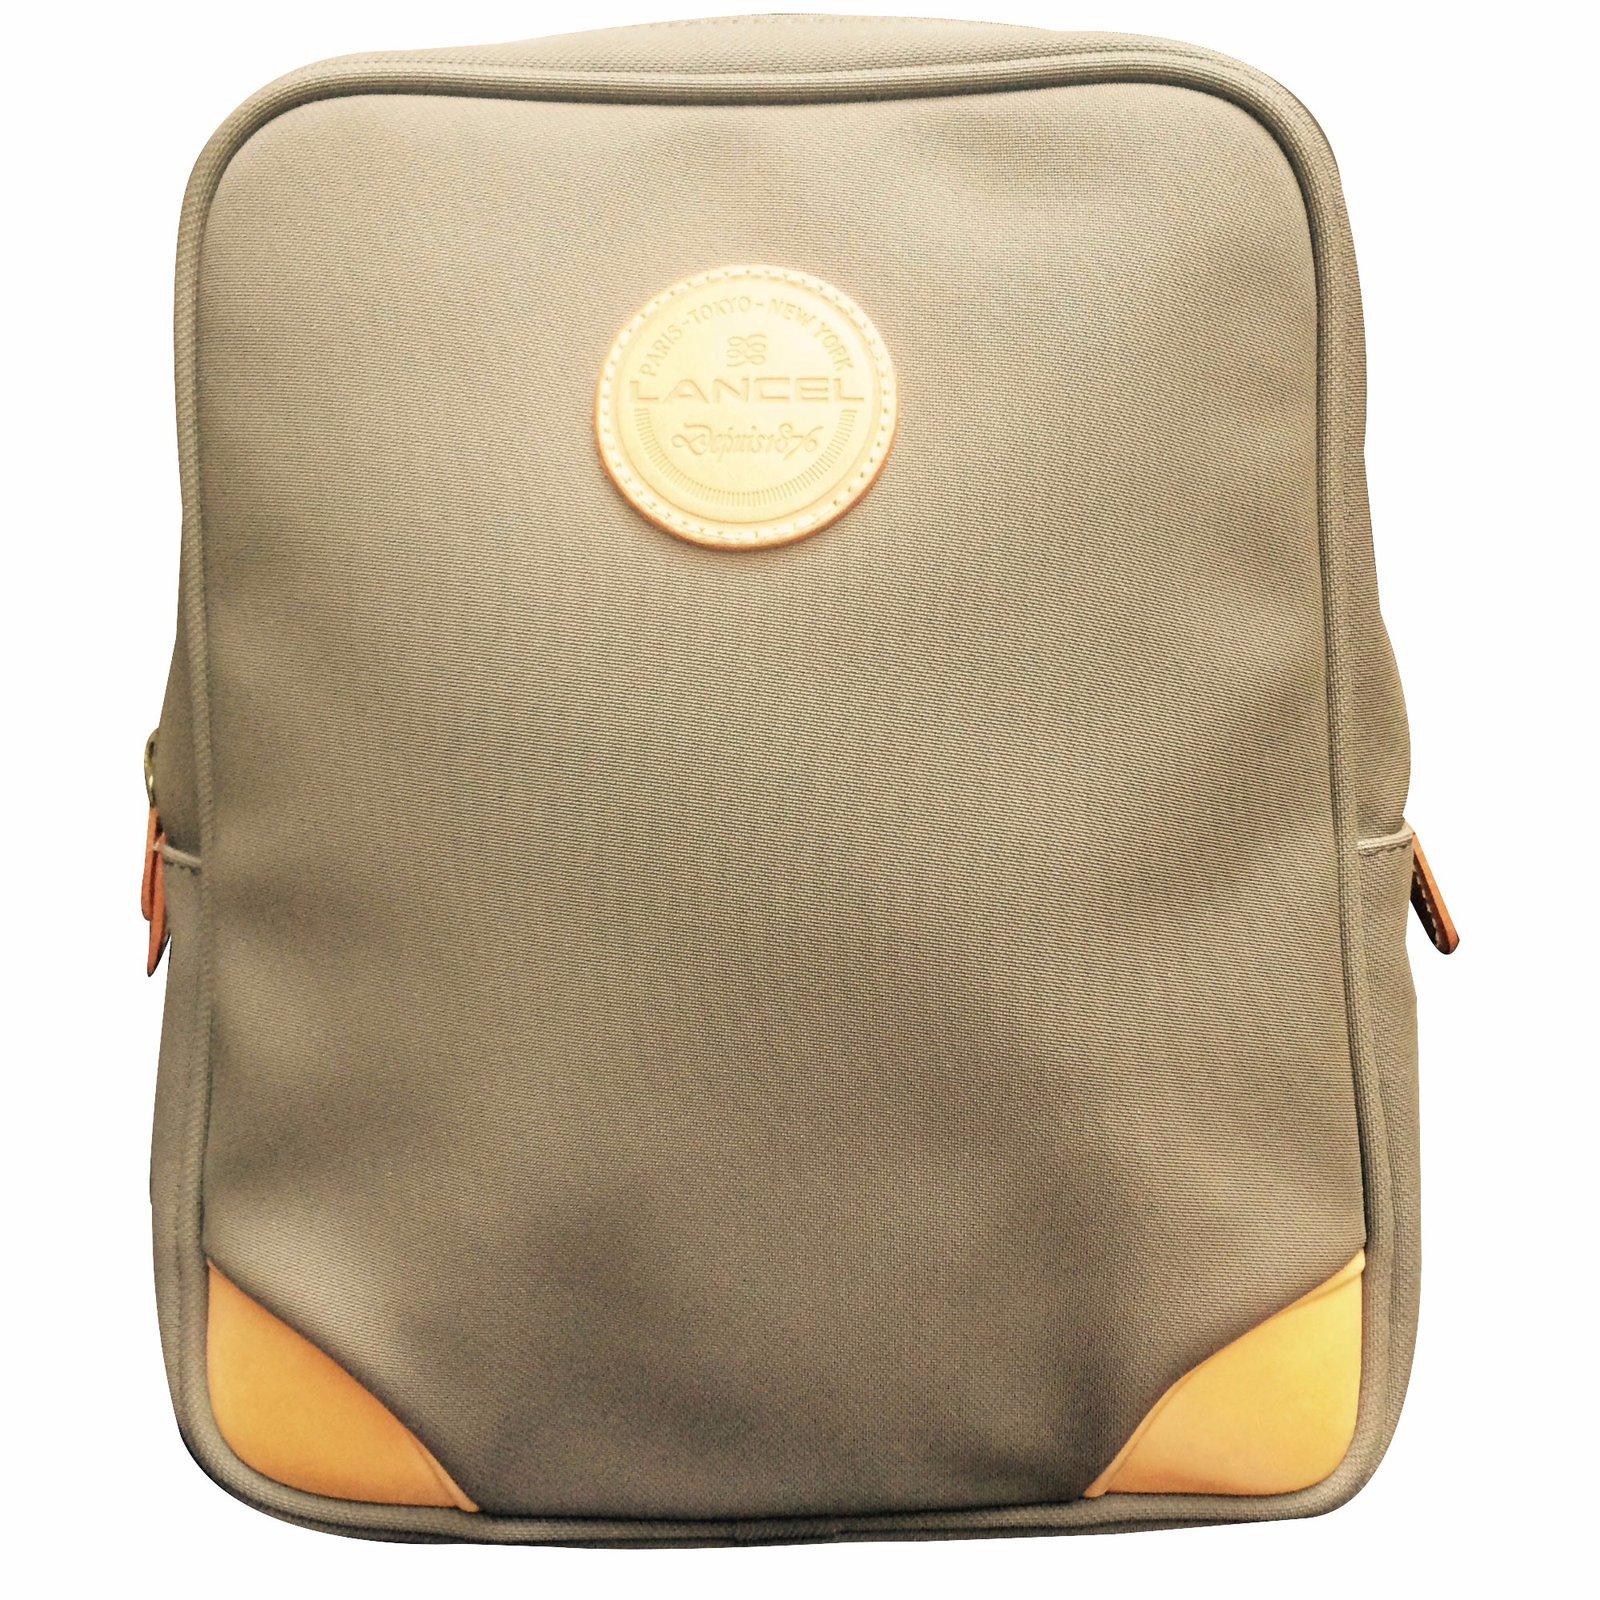 41bfca689442 Lancel Backpack Backpacks Cotton Light brown ref.21664 - Joli Closet